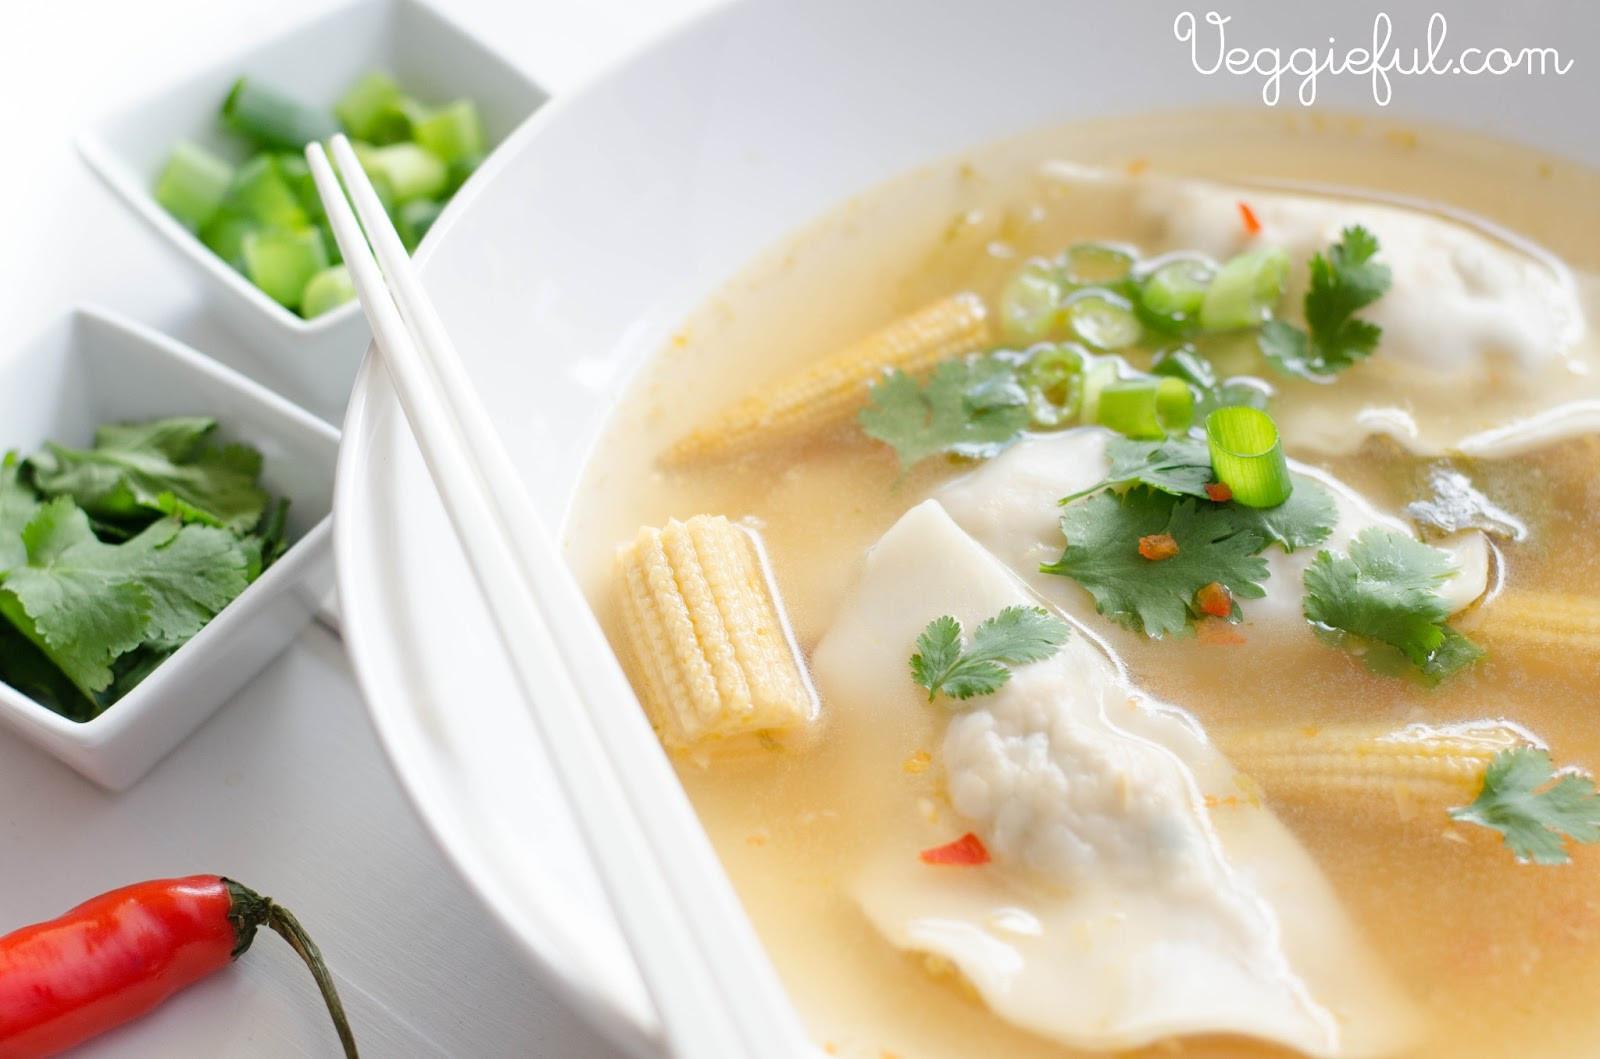 Soup Dumplings Recipe  how to make dumplings for chicken soup